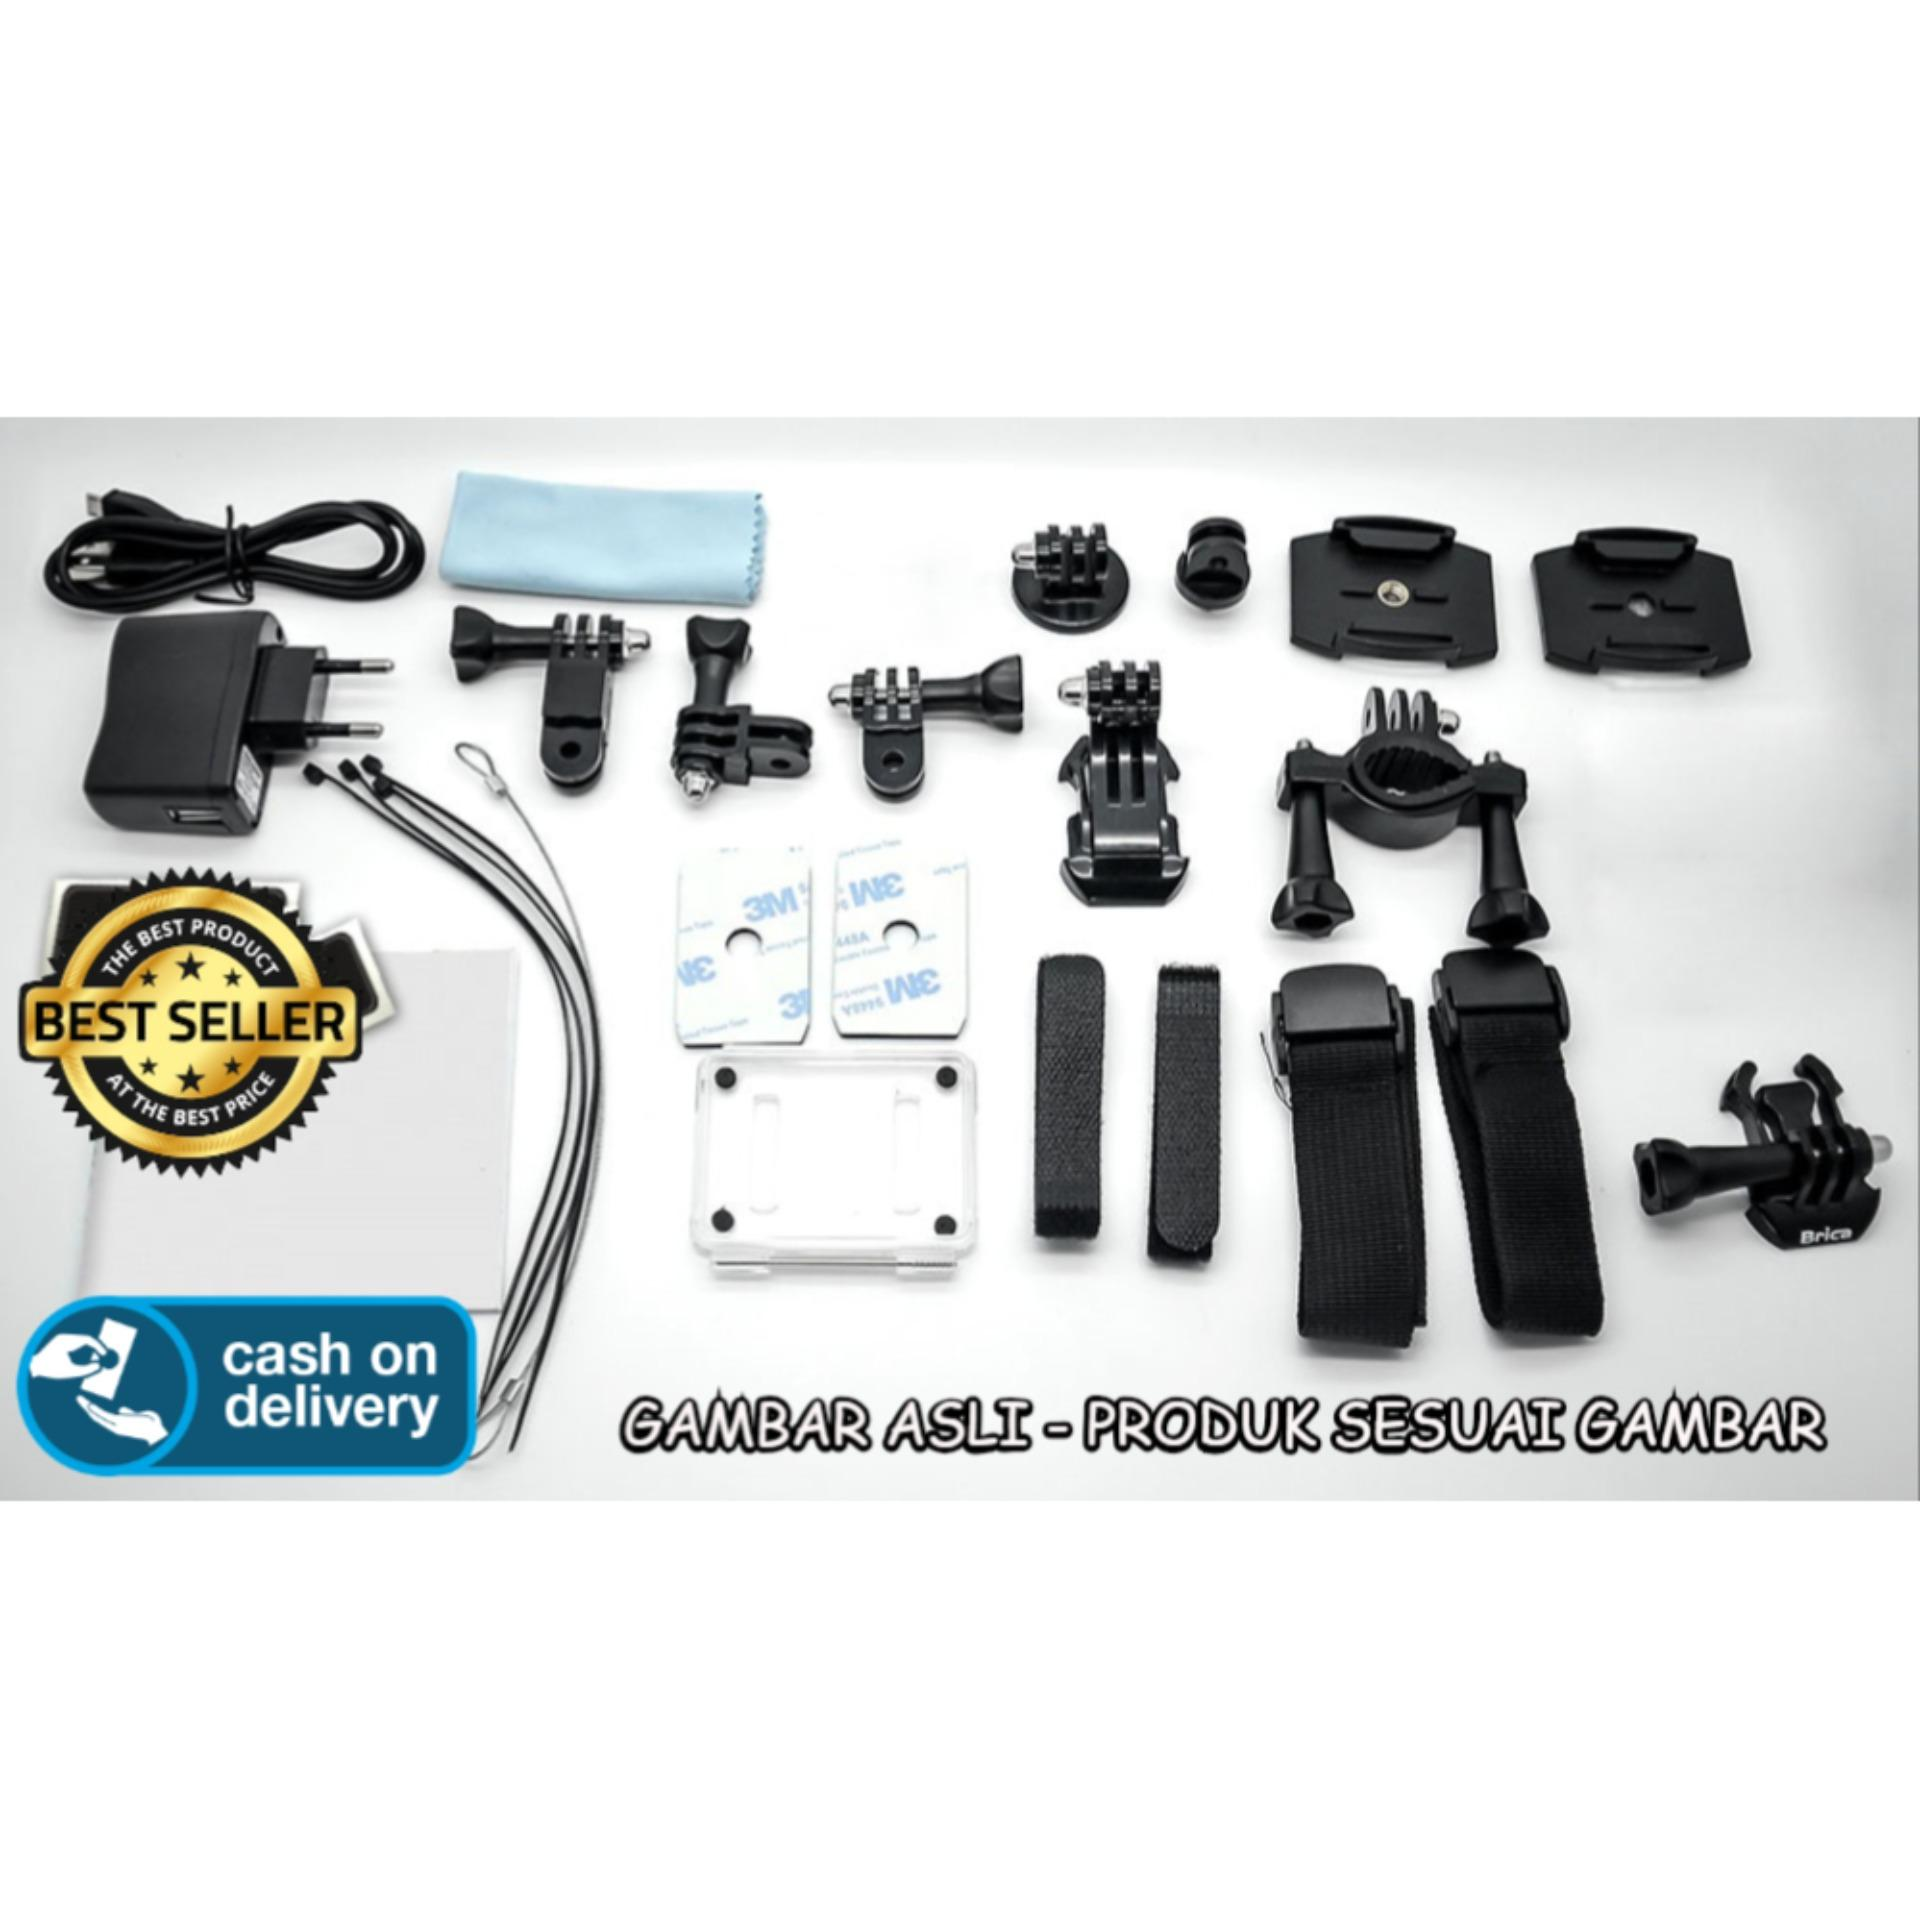 Fitur Big Store Acc Sports Cam Action Wifi Non Ultra Hd 4k Kamera Sport Go Pro Kogan